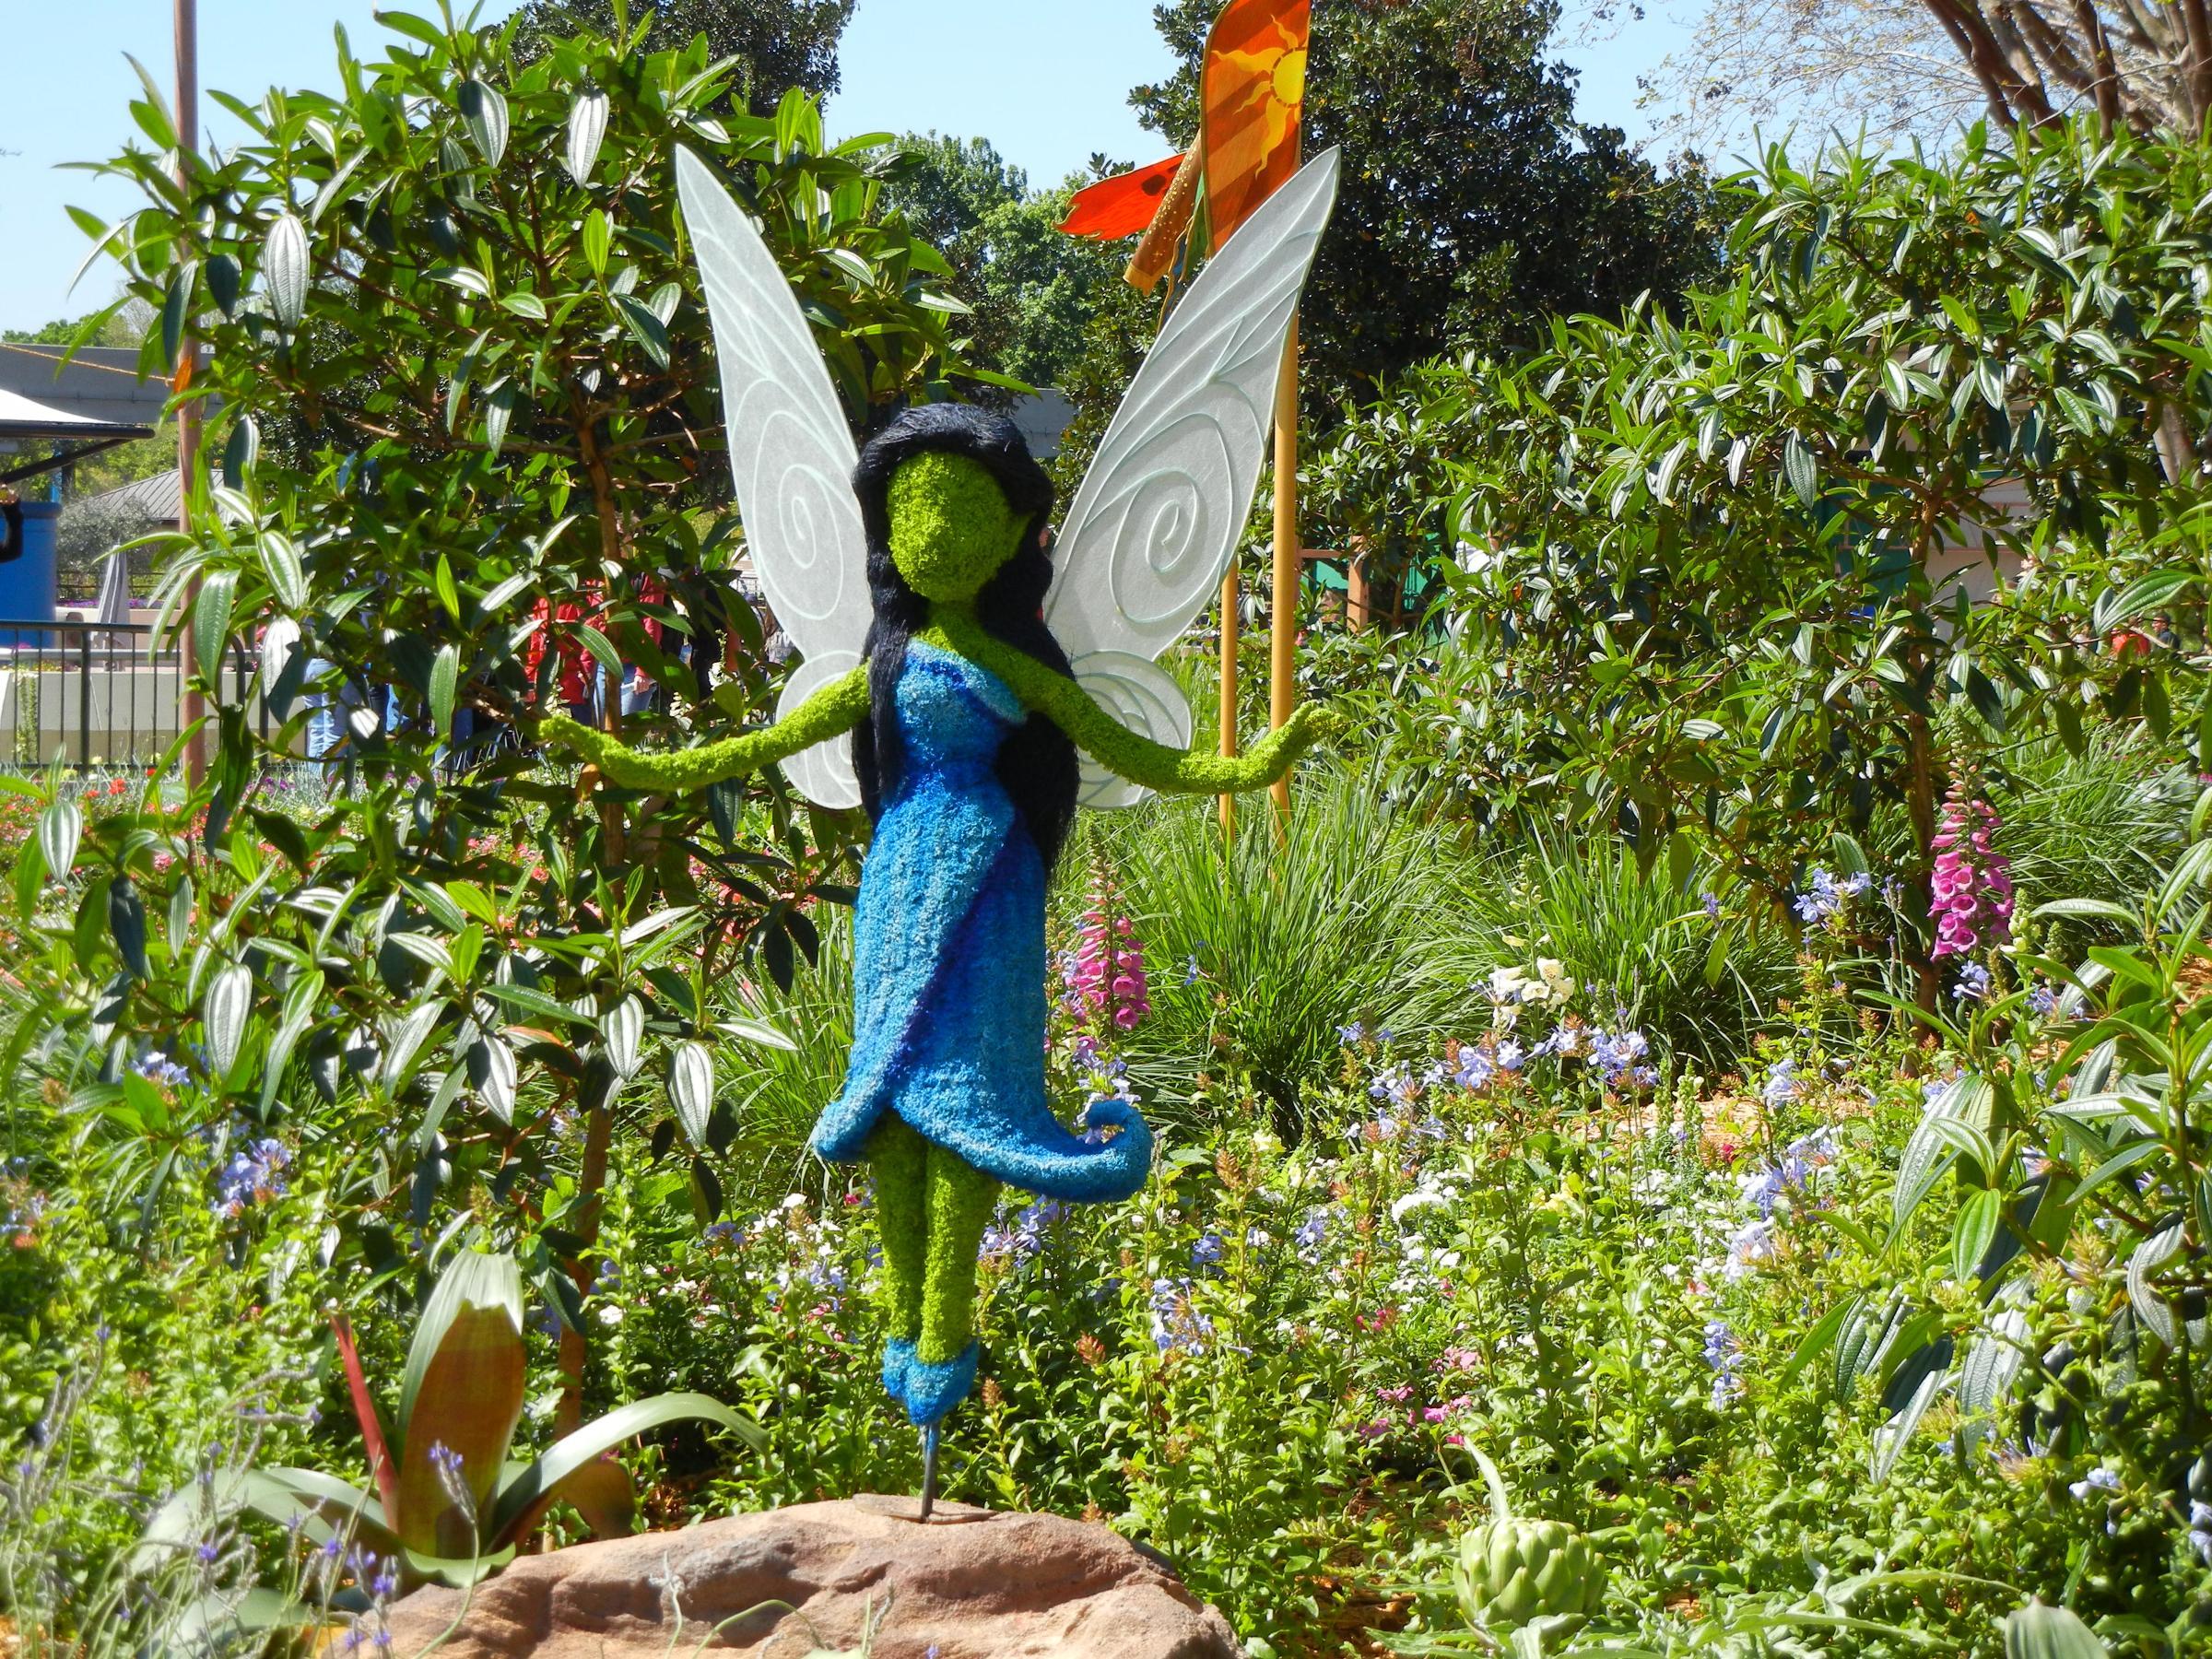 Silvermist the Water Fairy